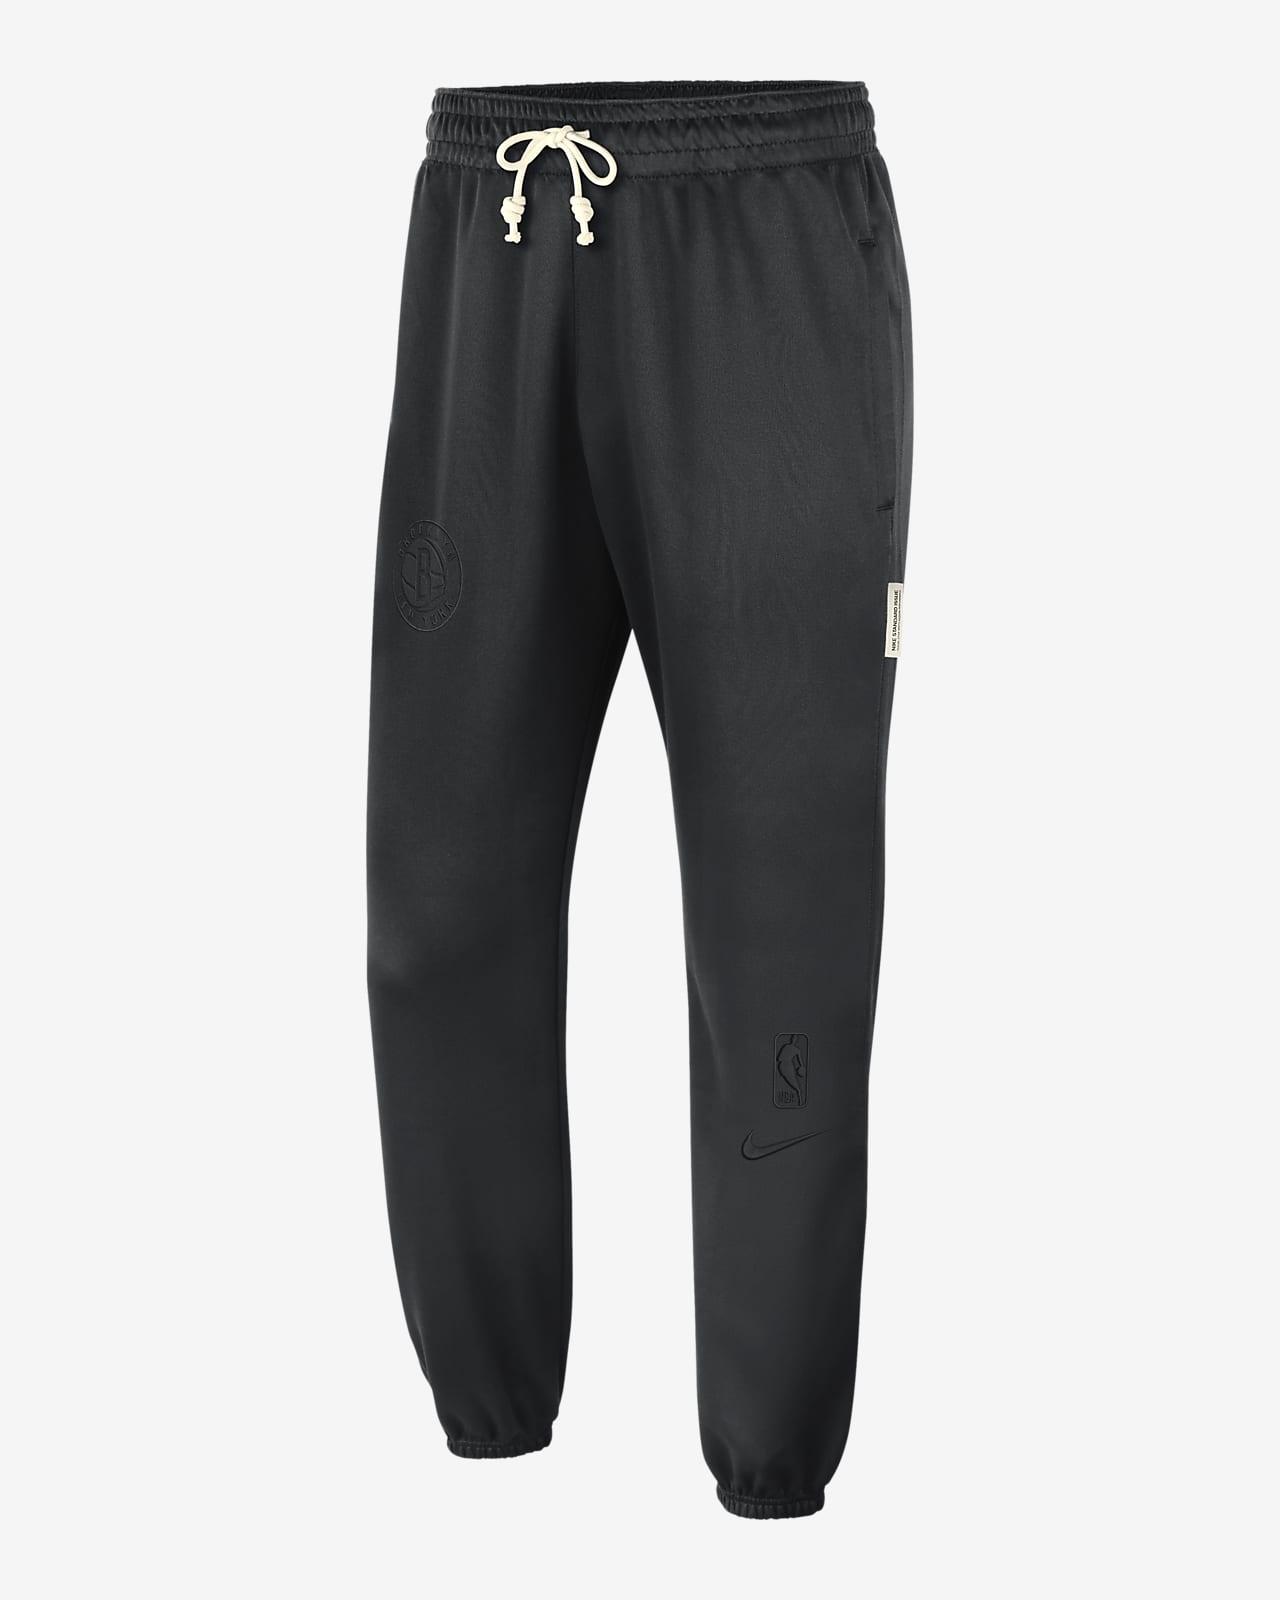 Nets Standard Issue Men's Nike Dri-FIT NBA Trousers